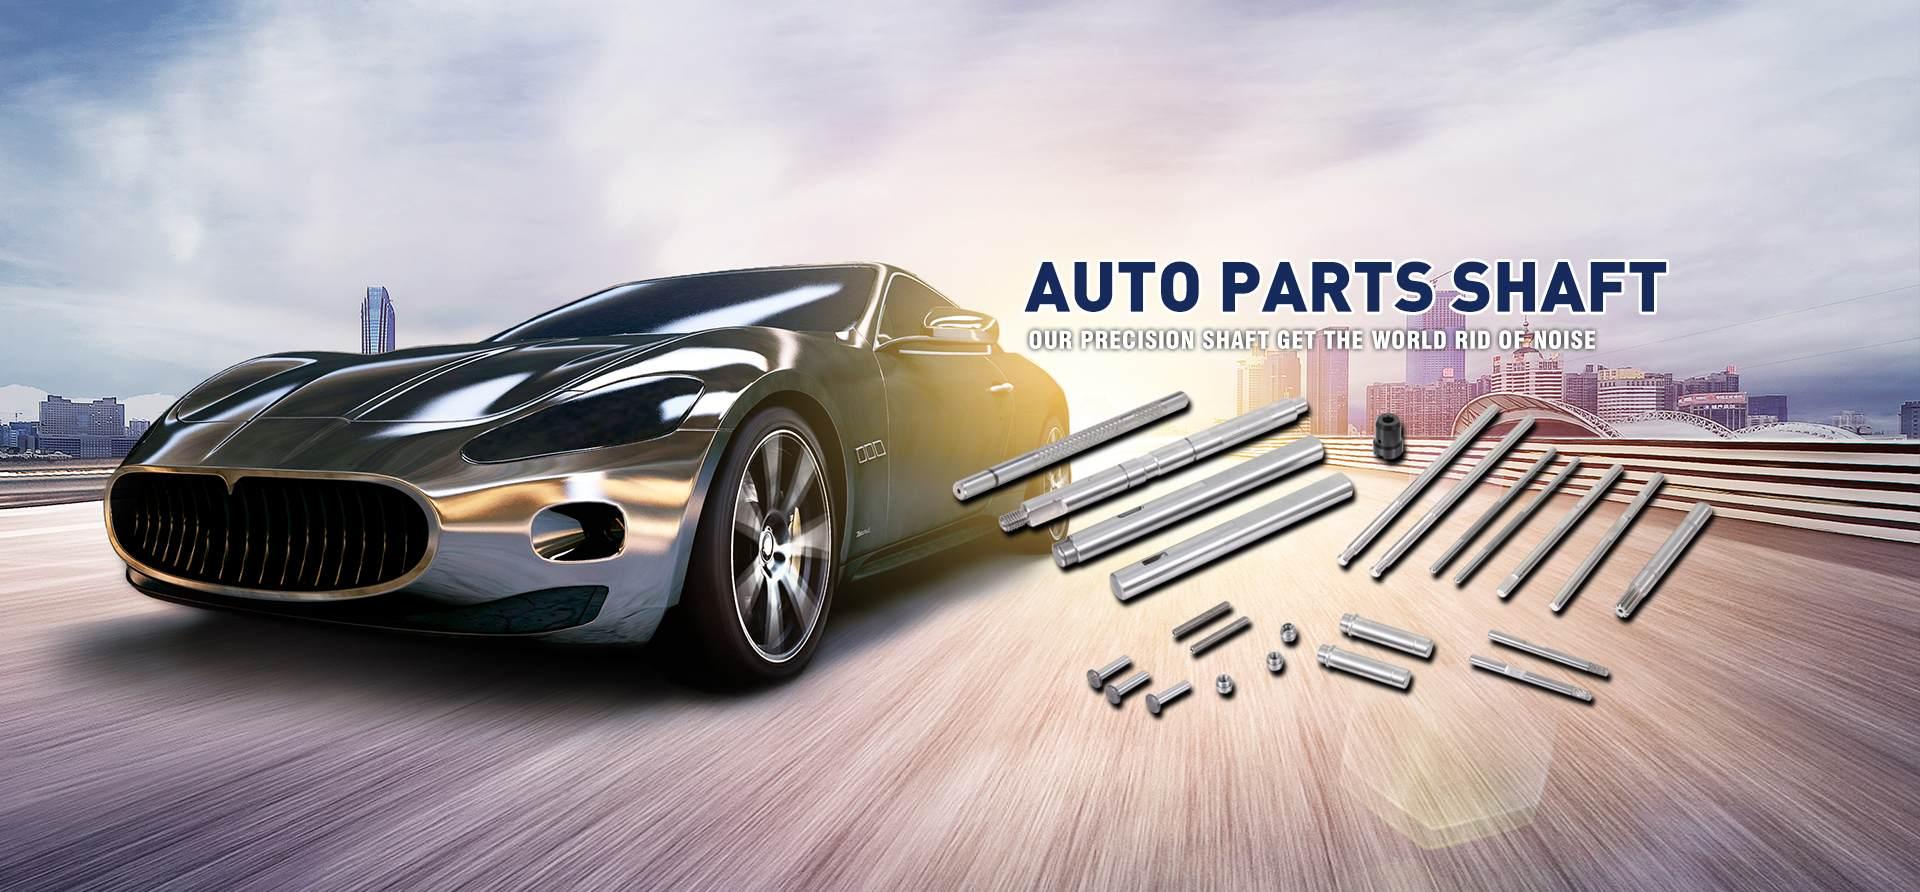 Auto Parts Shaft